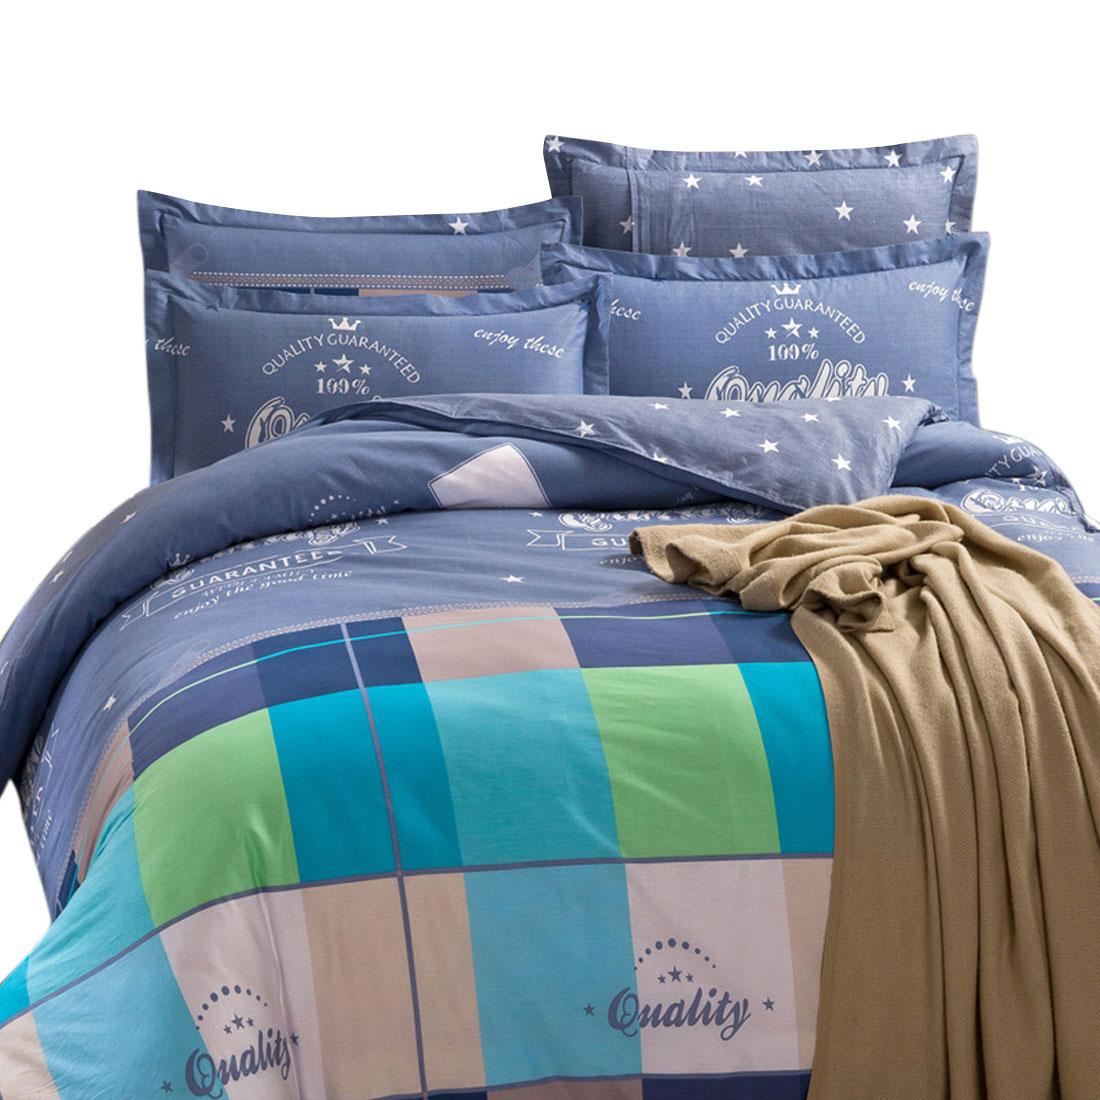 Bedroom Single Double King Duvet Quilt Covers Pillowcase Bedding Set